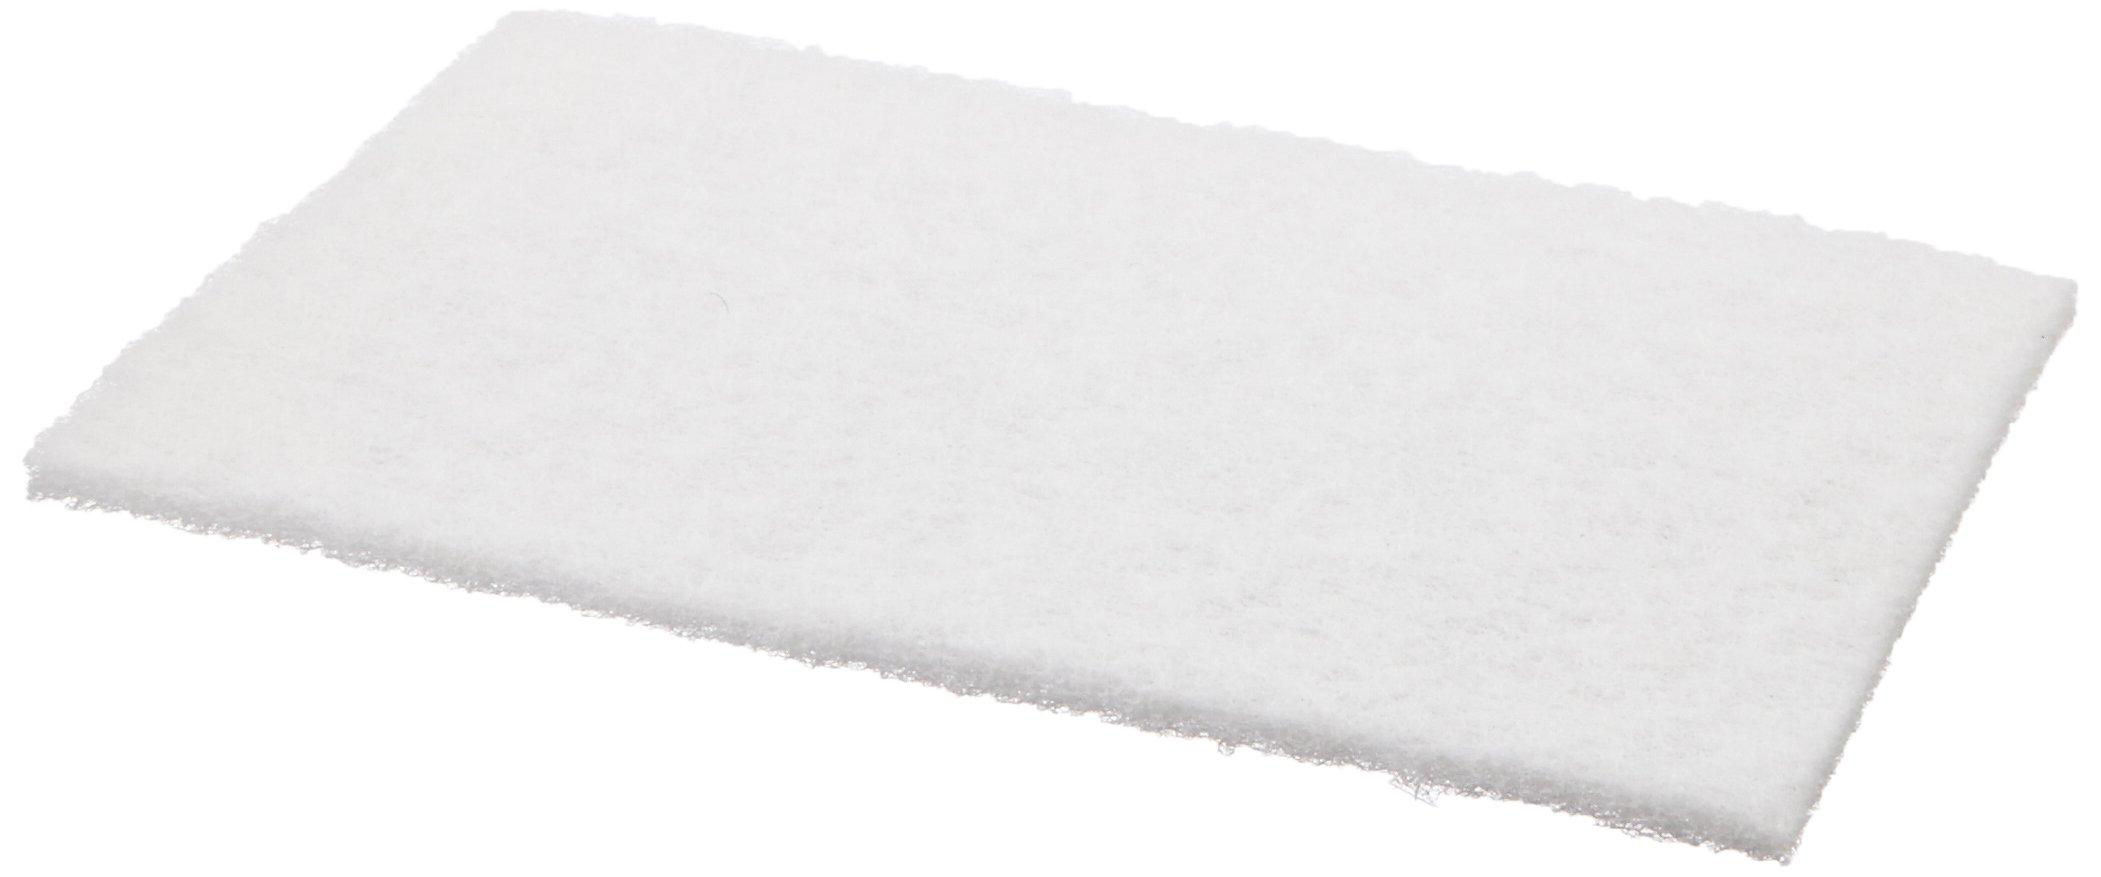 Scotch-Brite(TM) Light Cleansing Pad 7445, Aluminum Silicate, 9'' Length x 6'' Width, White  (Pack of 20)